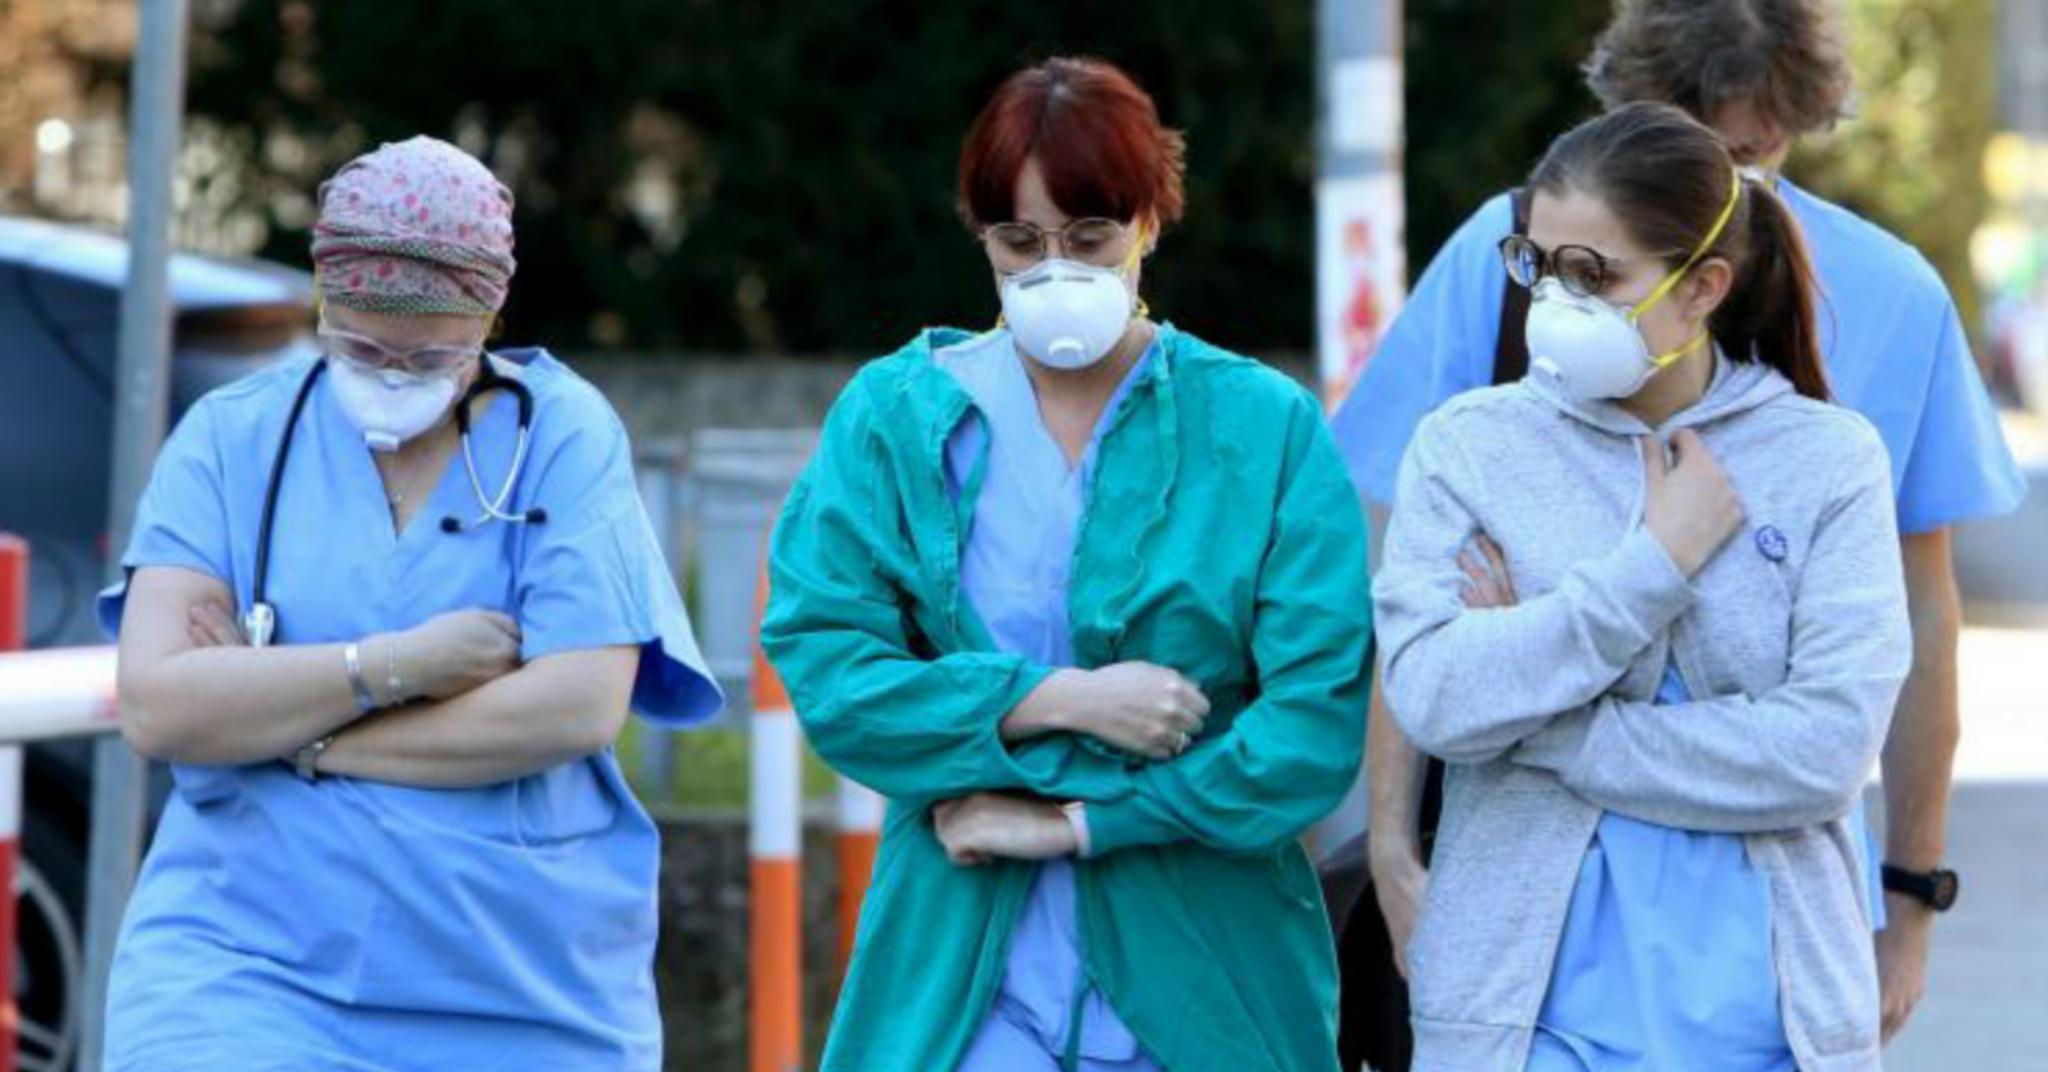 Coronavirus, 11 vittime: morta 76enne di Treviso